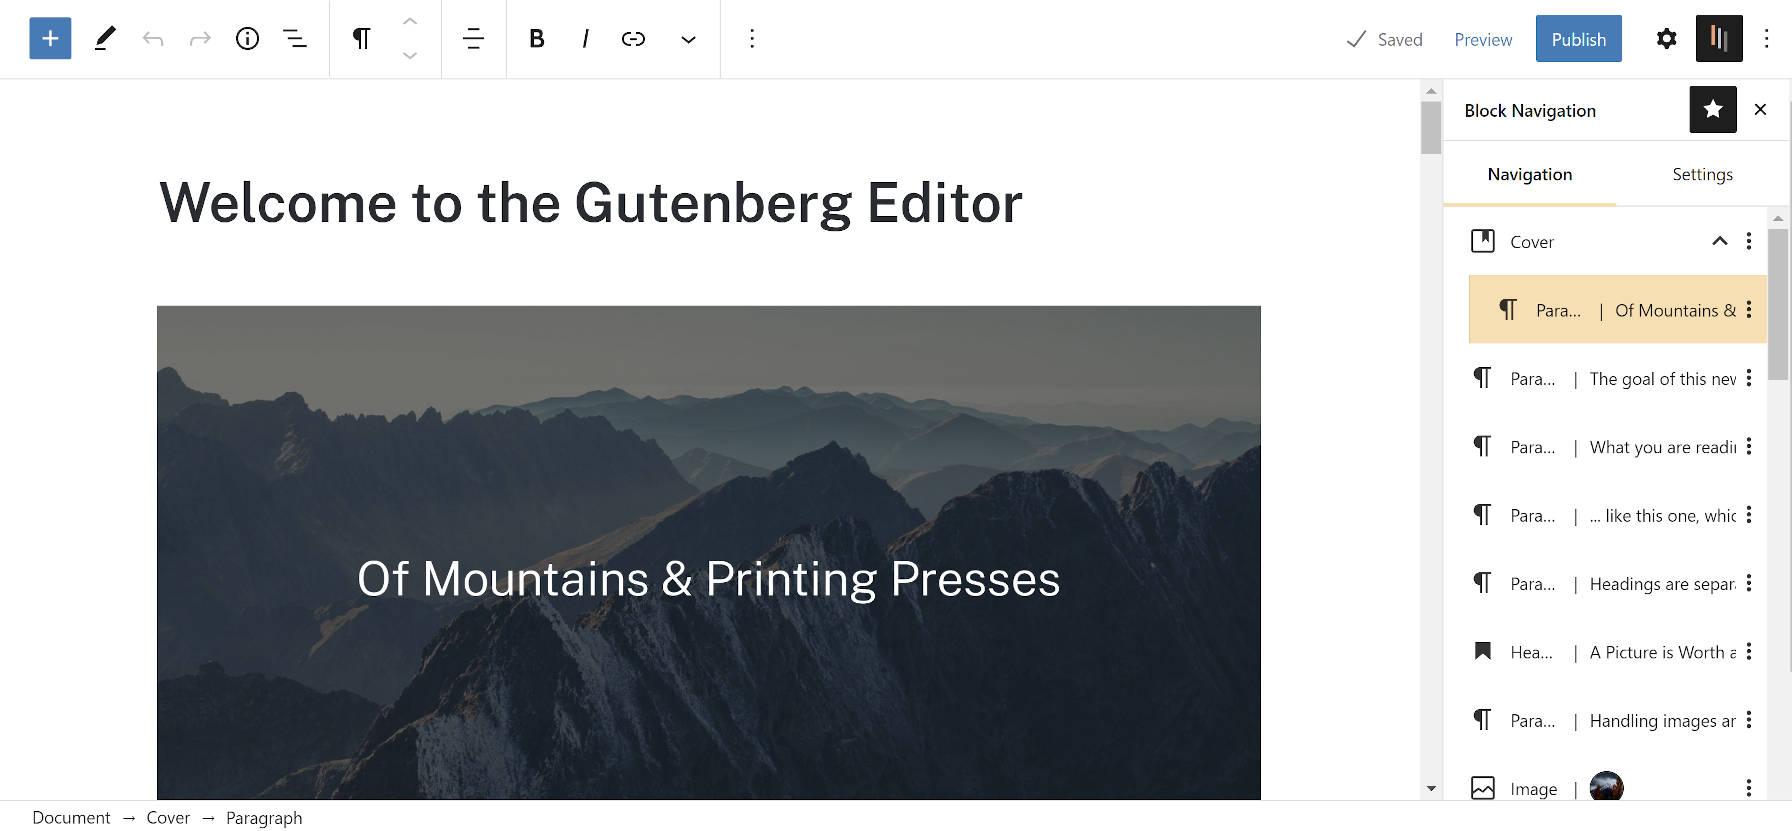 Block Navigation sidebar in the WordPress editor.